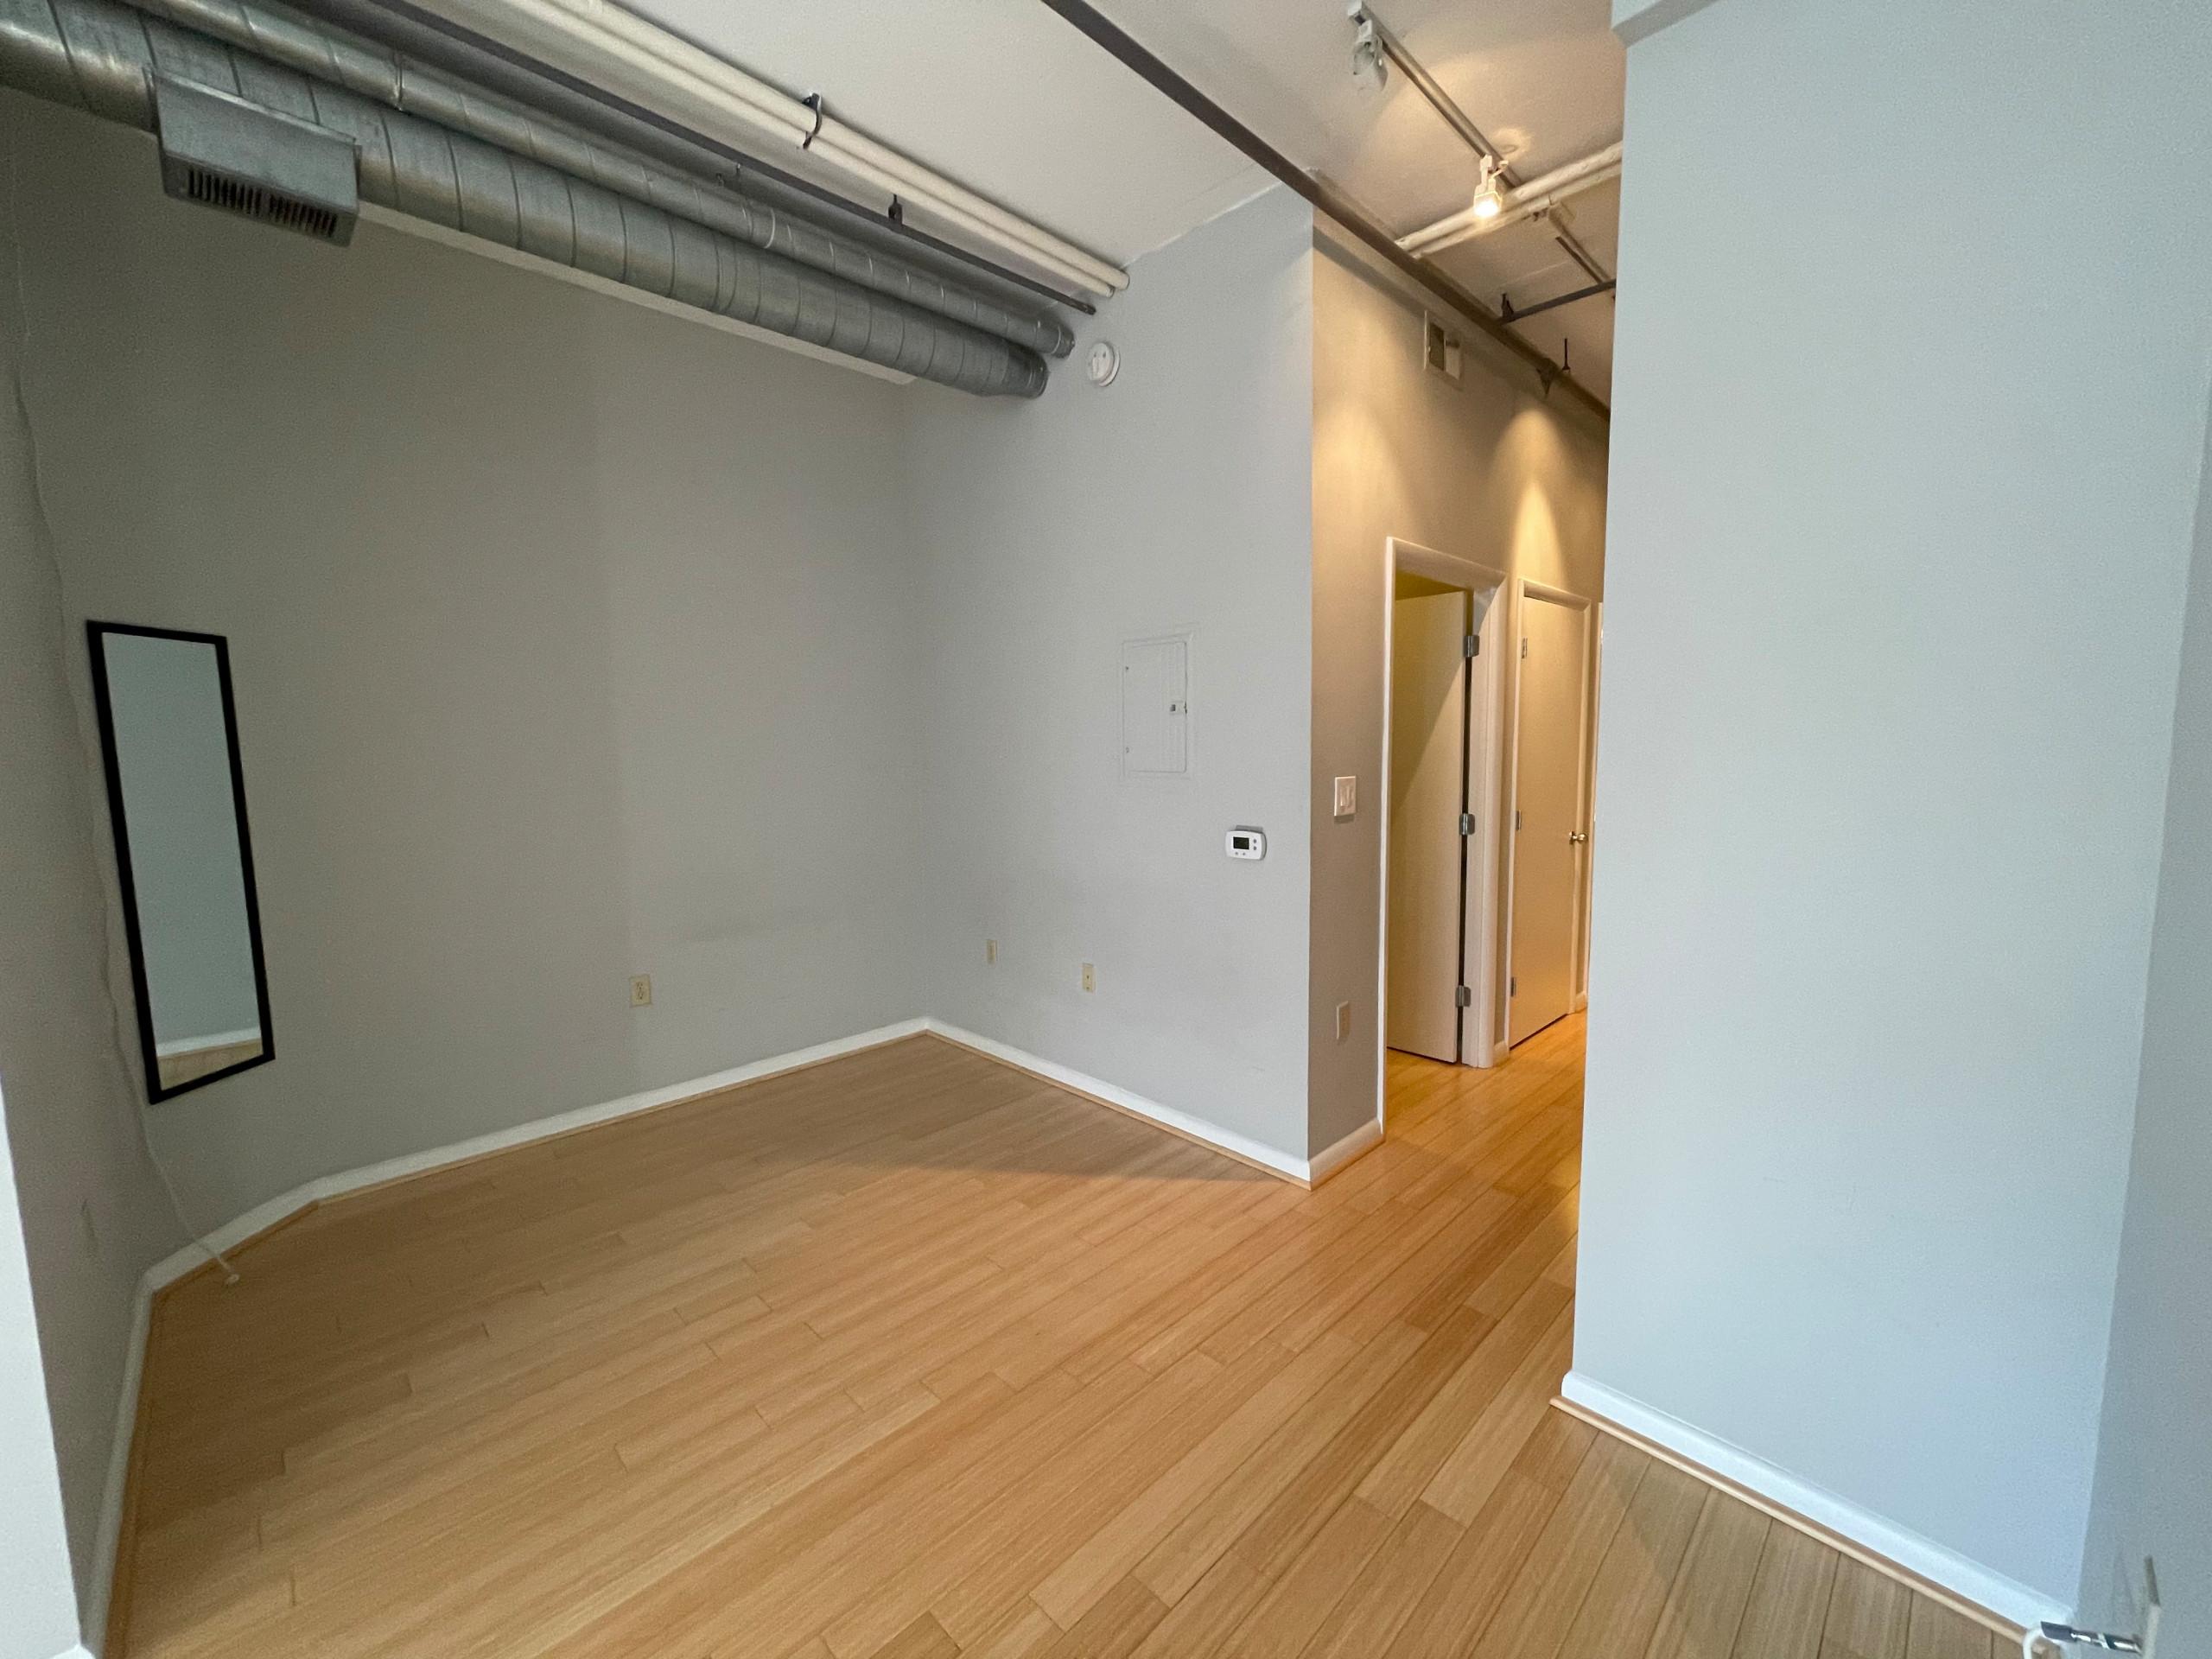 Chic Studio | N St NW | Washington, DC